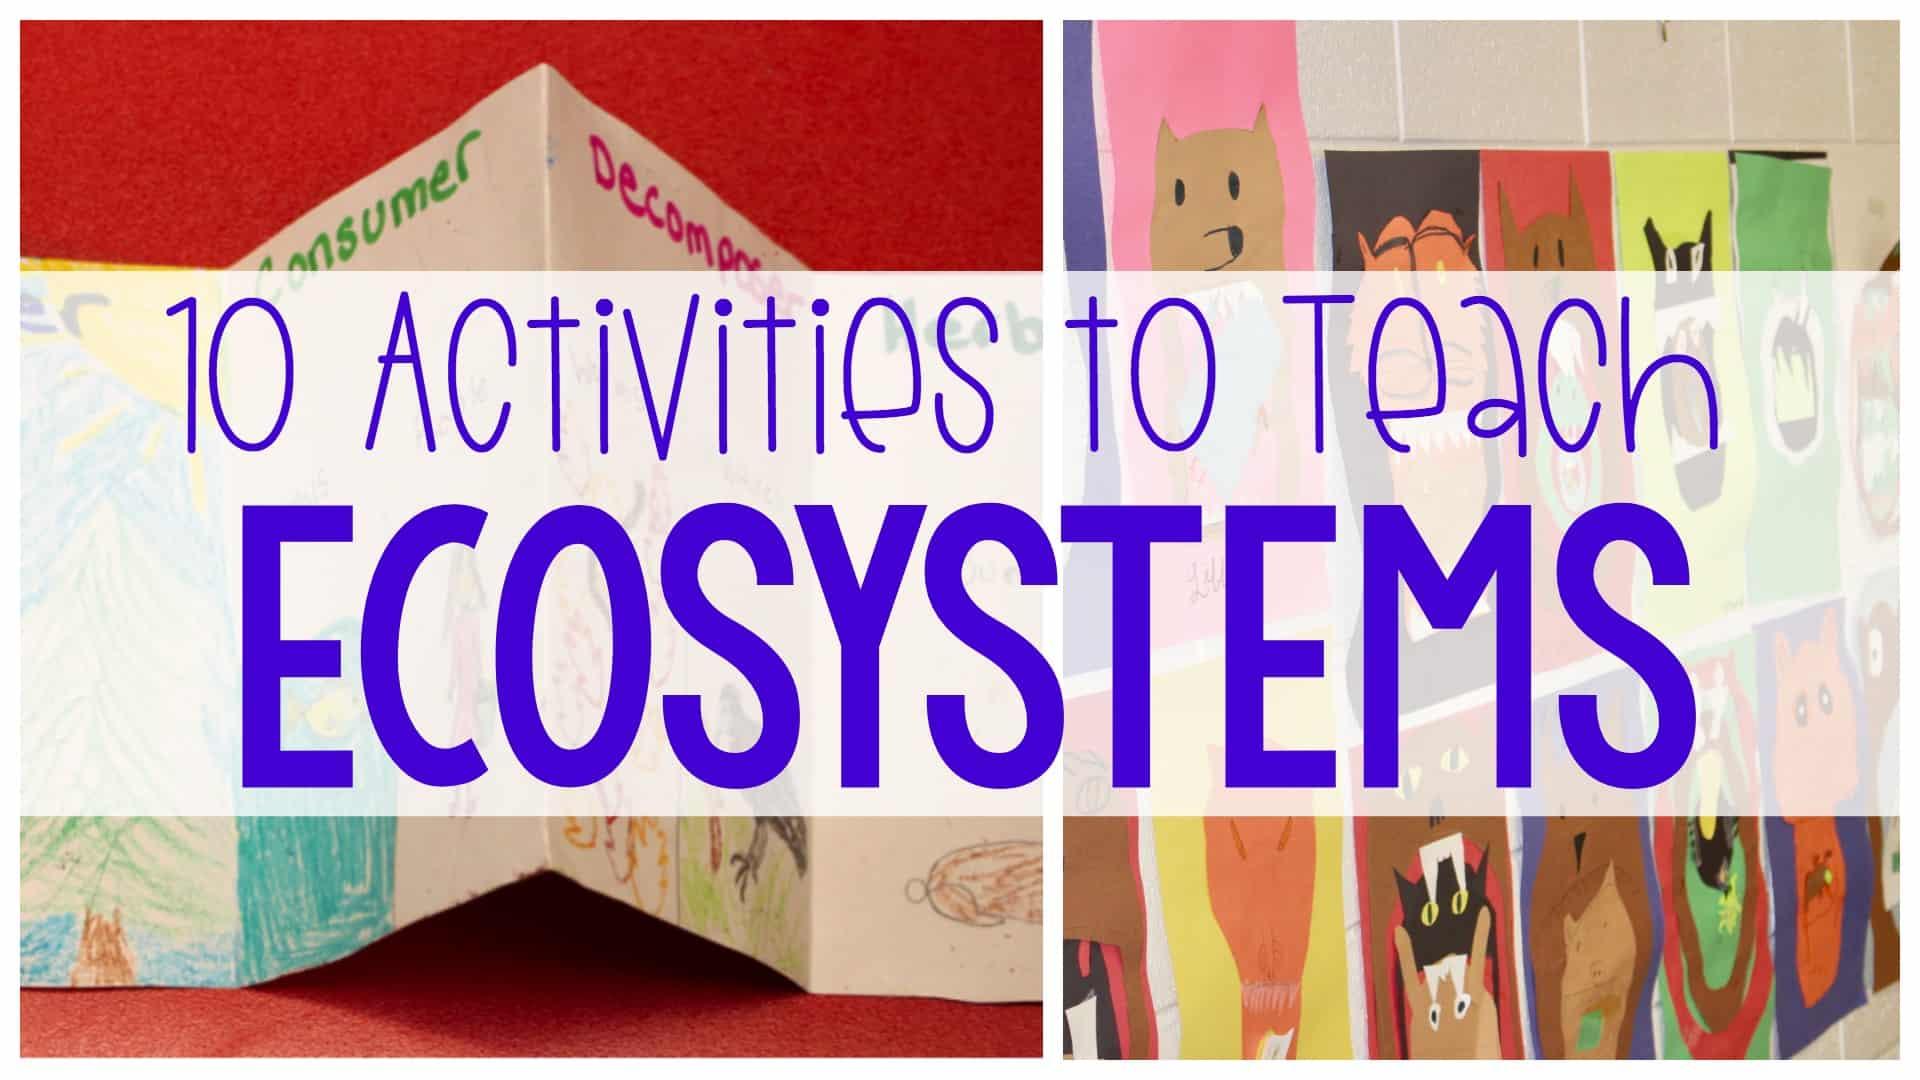 10 Activities to Teach Ecosystems Heading